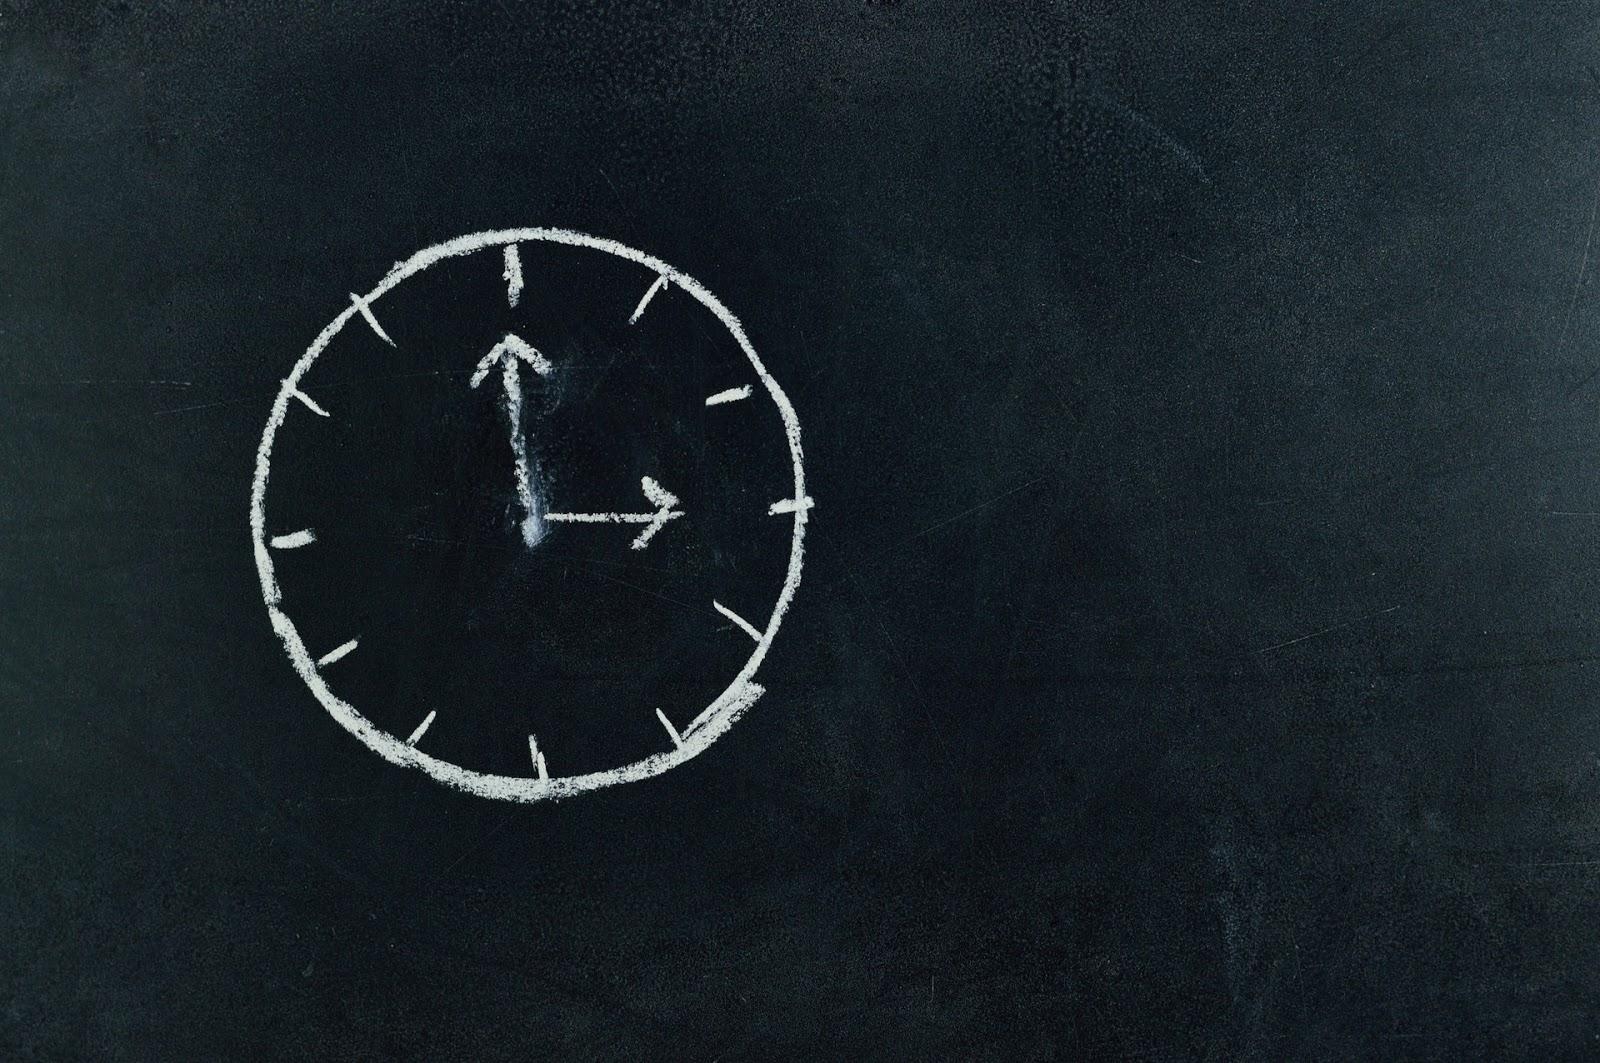 drawing of a clock on a blackboard